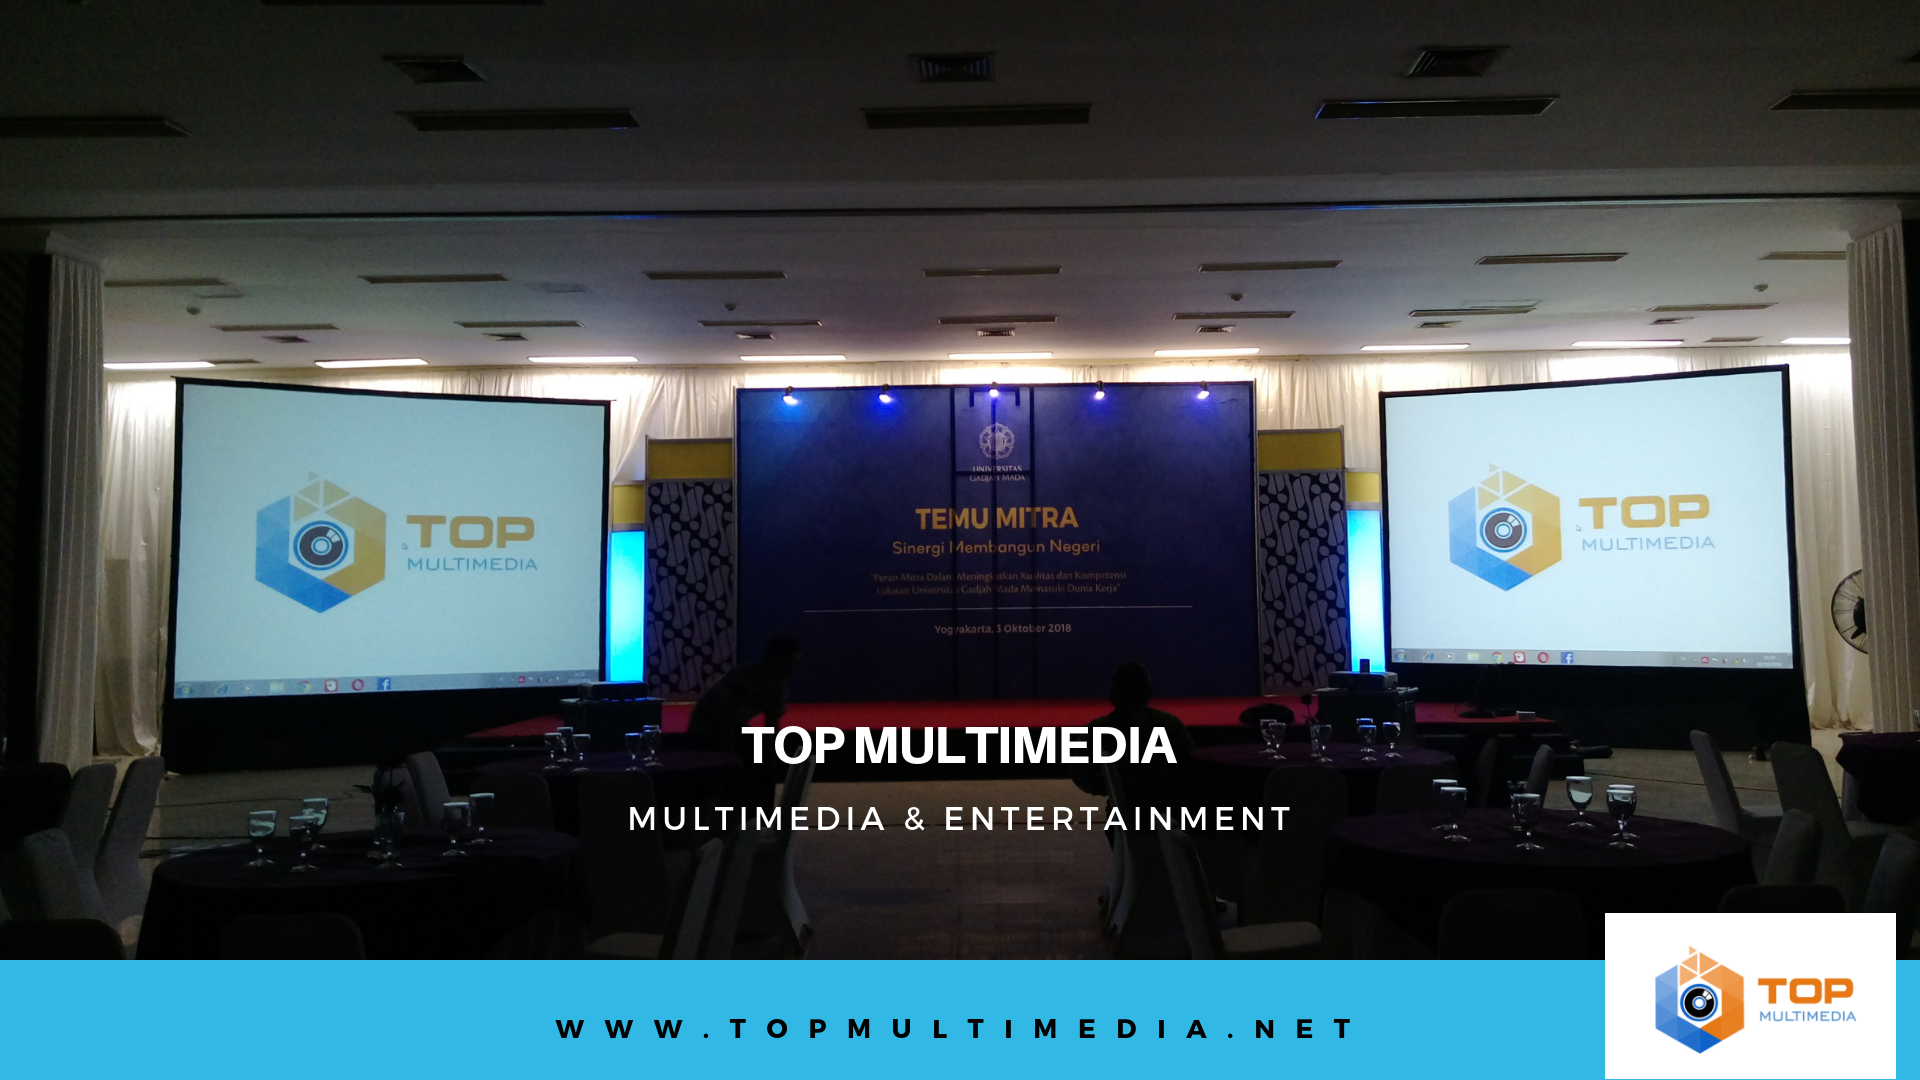 Kelebihan Sewa Proyektor dan Screen di Top Multimedia